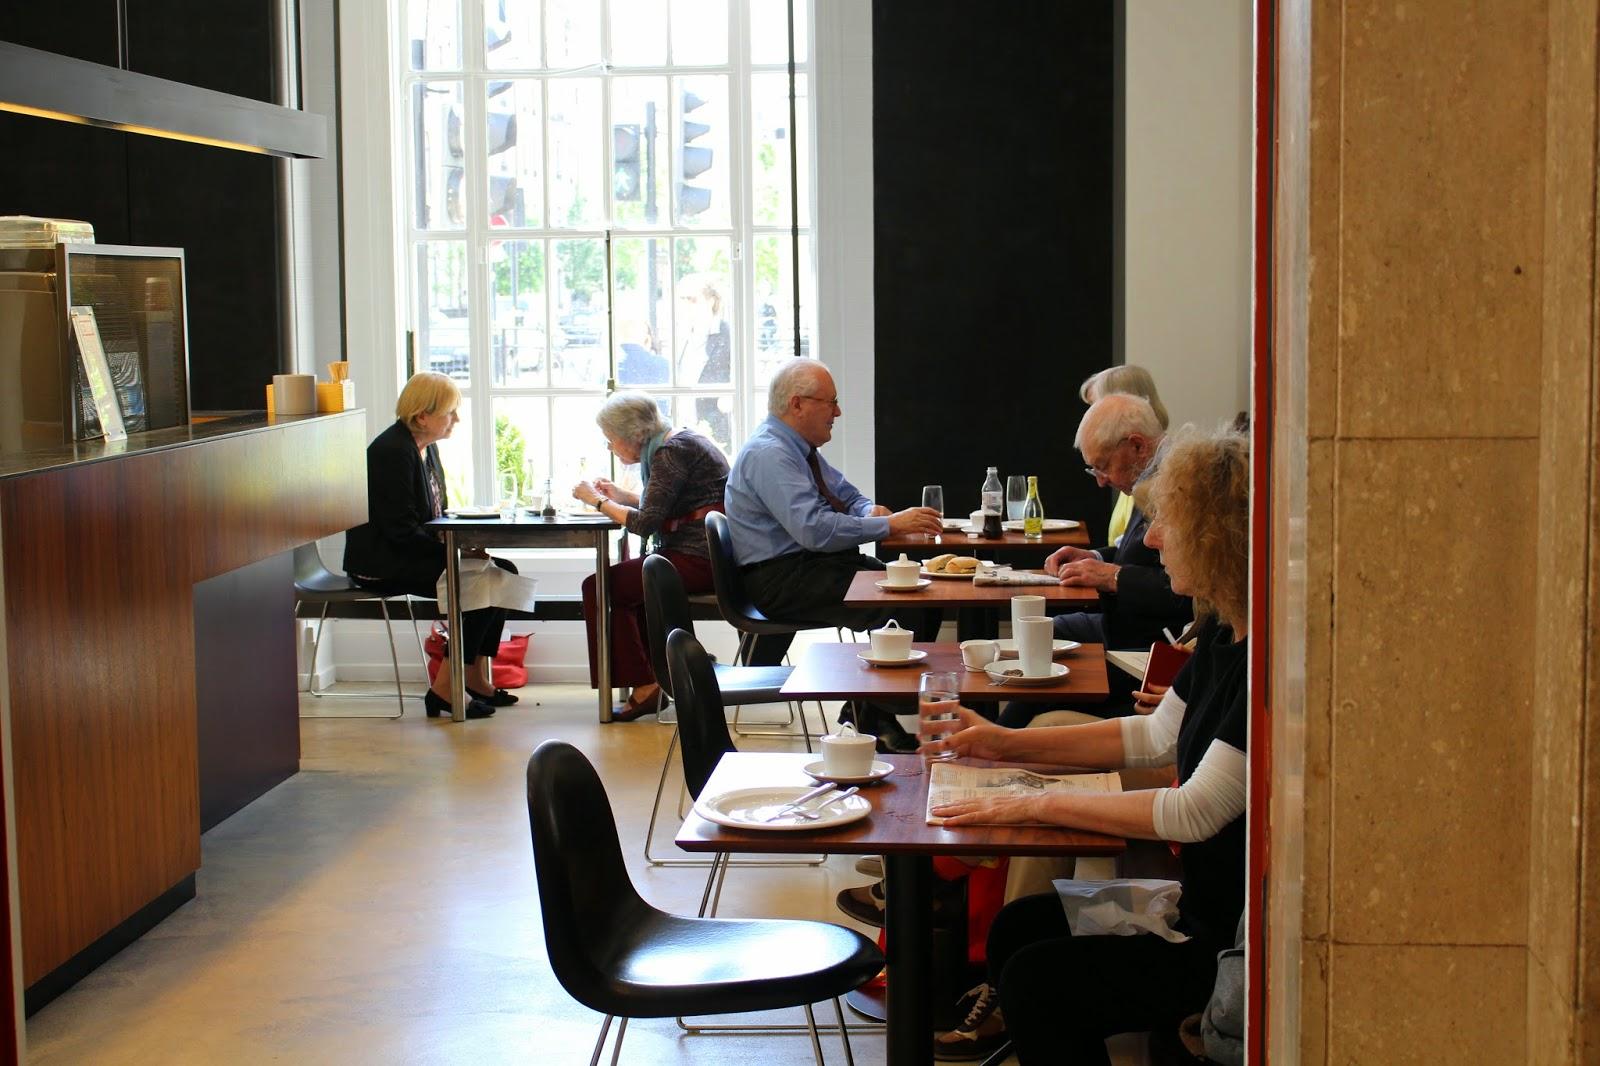 London free wifi study spots RIBA